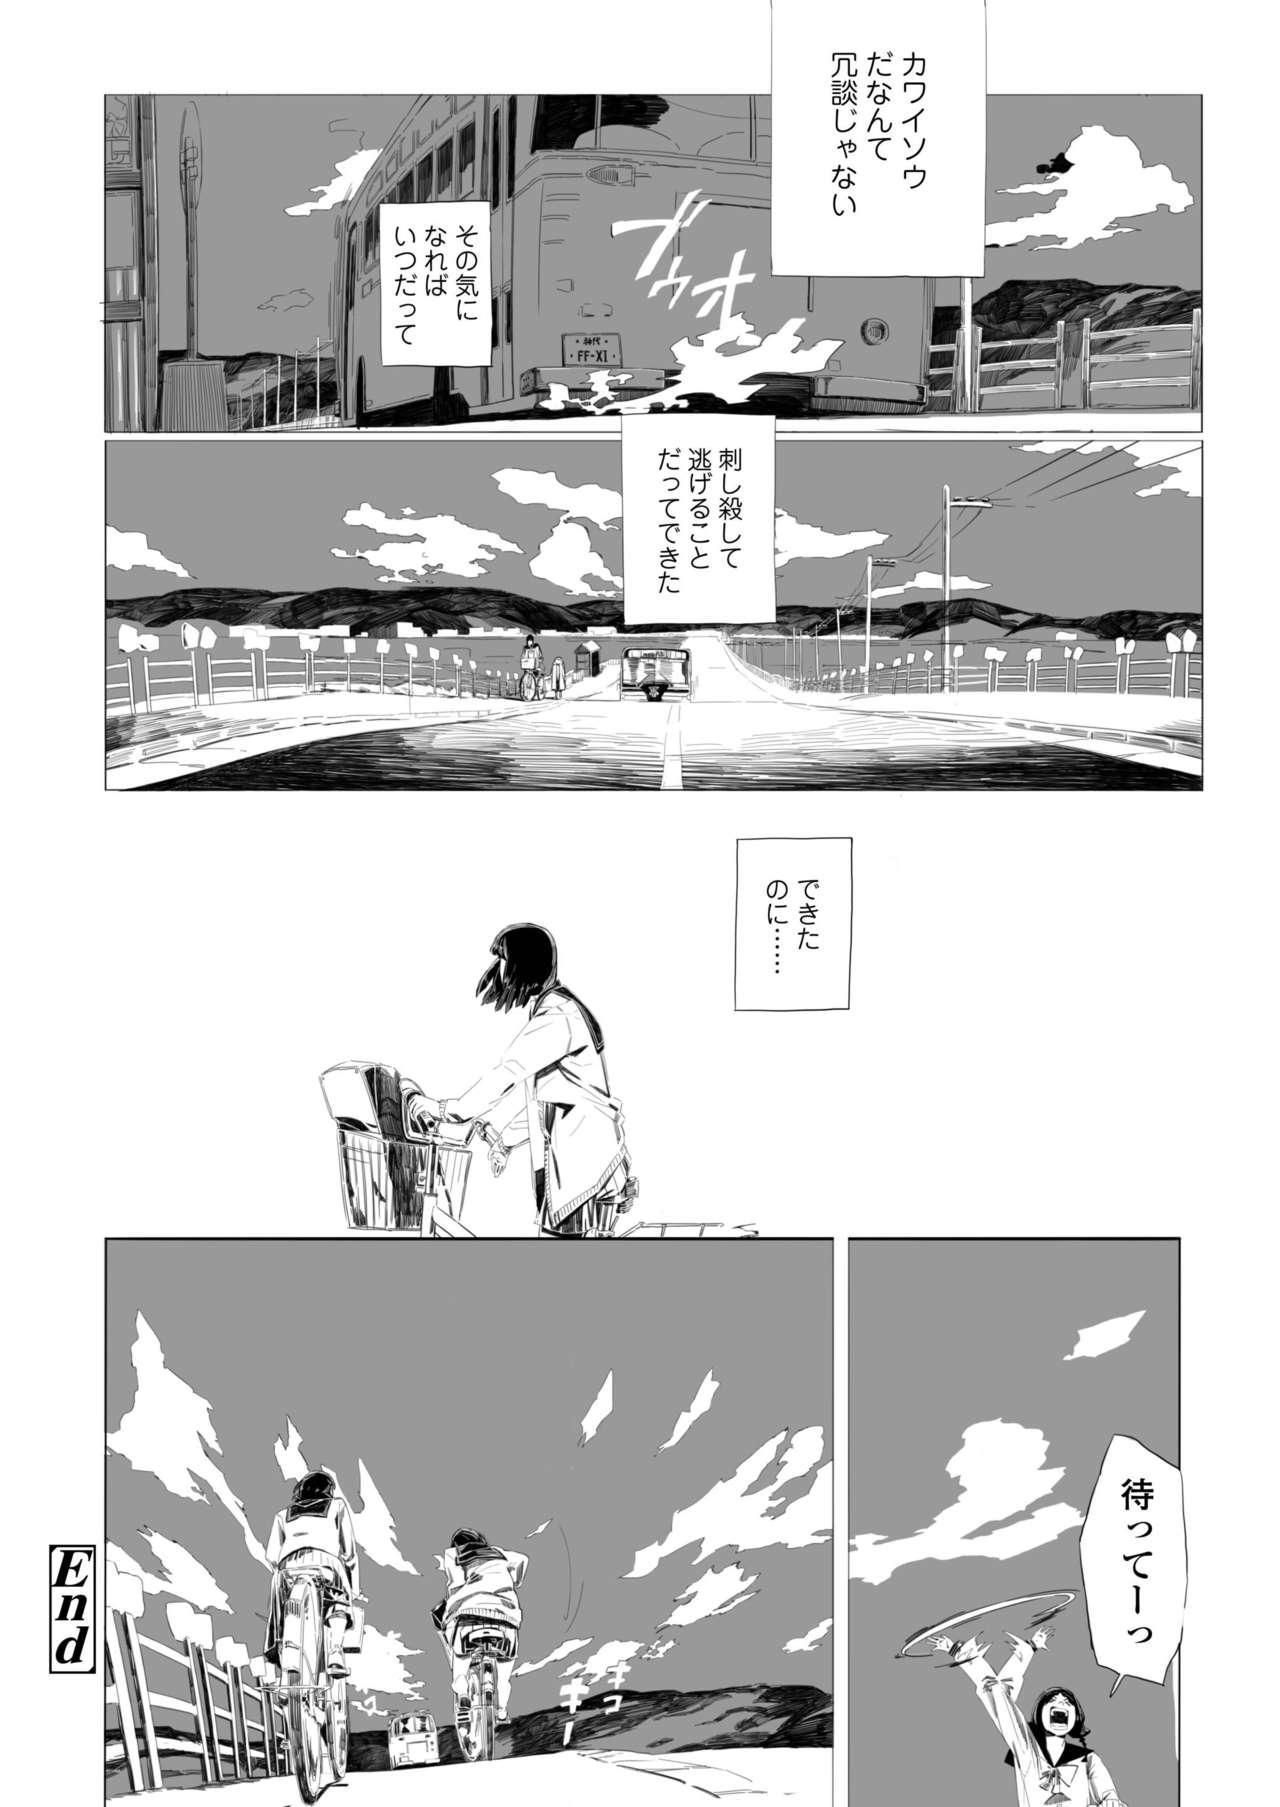 COMIC AOHA 2019 Haru 417